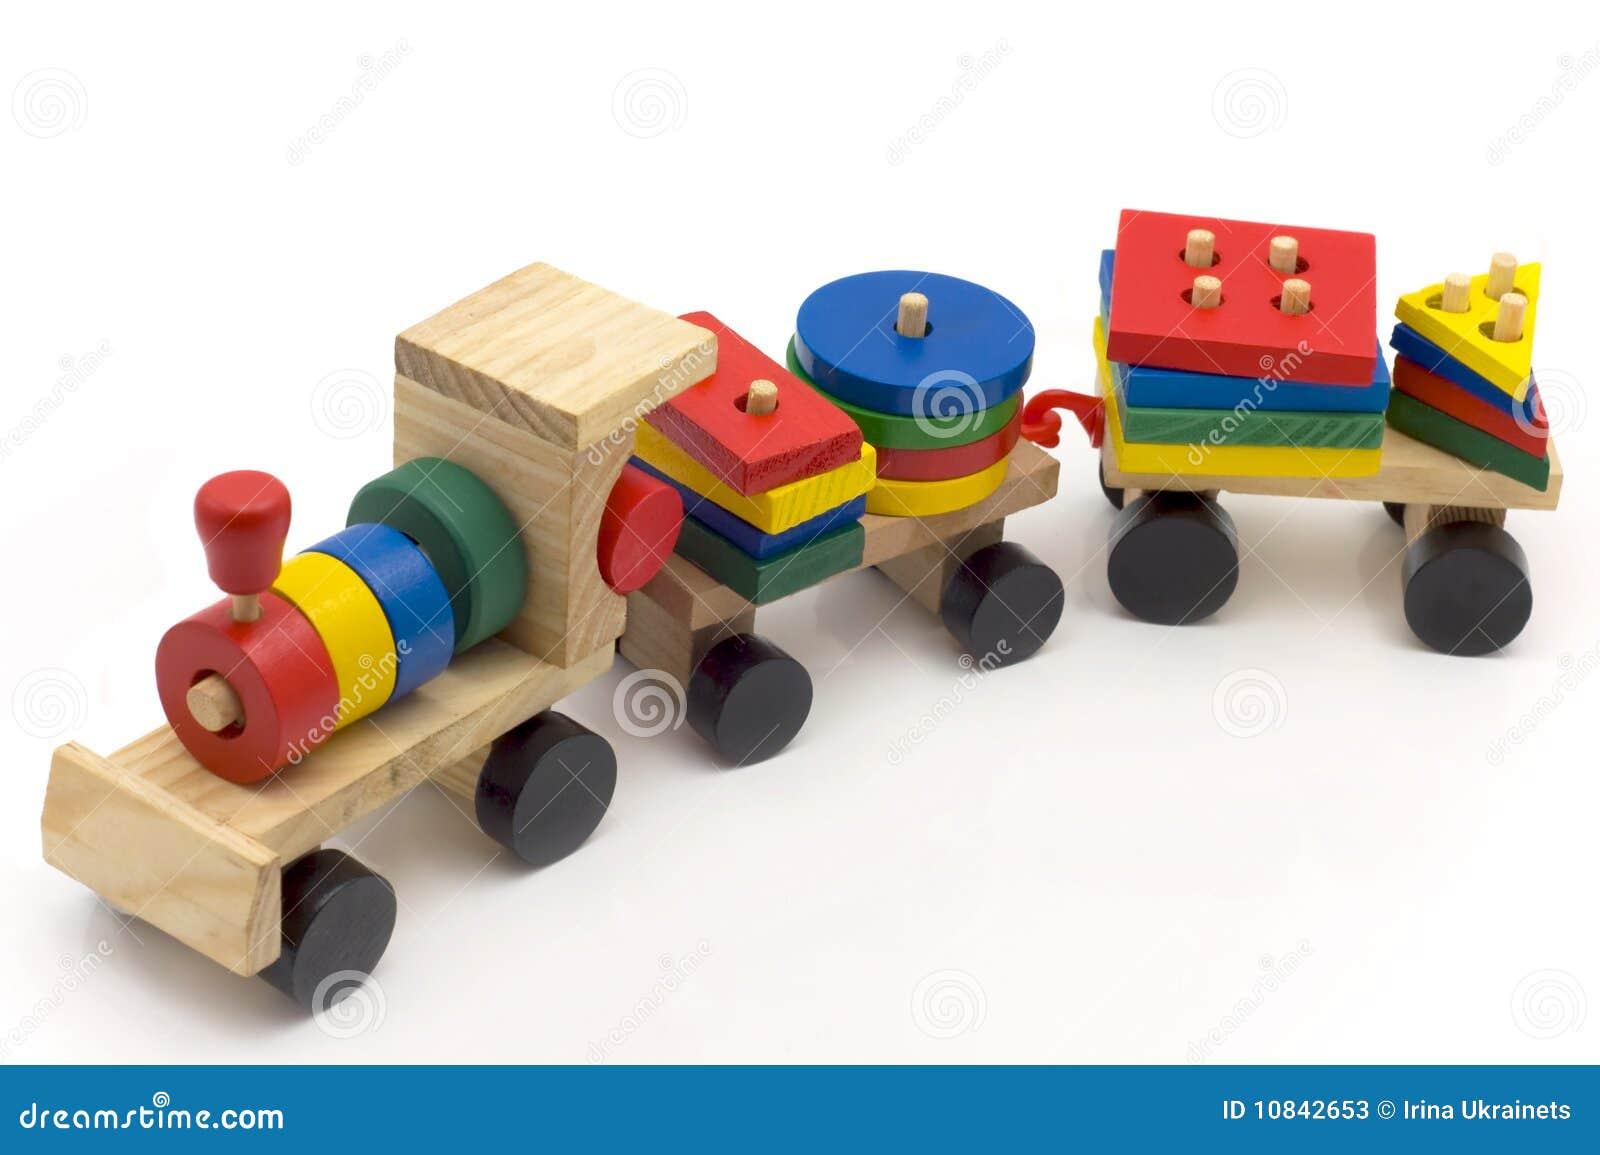 Children's Toy Train Stock Photos - Image: 10842653